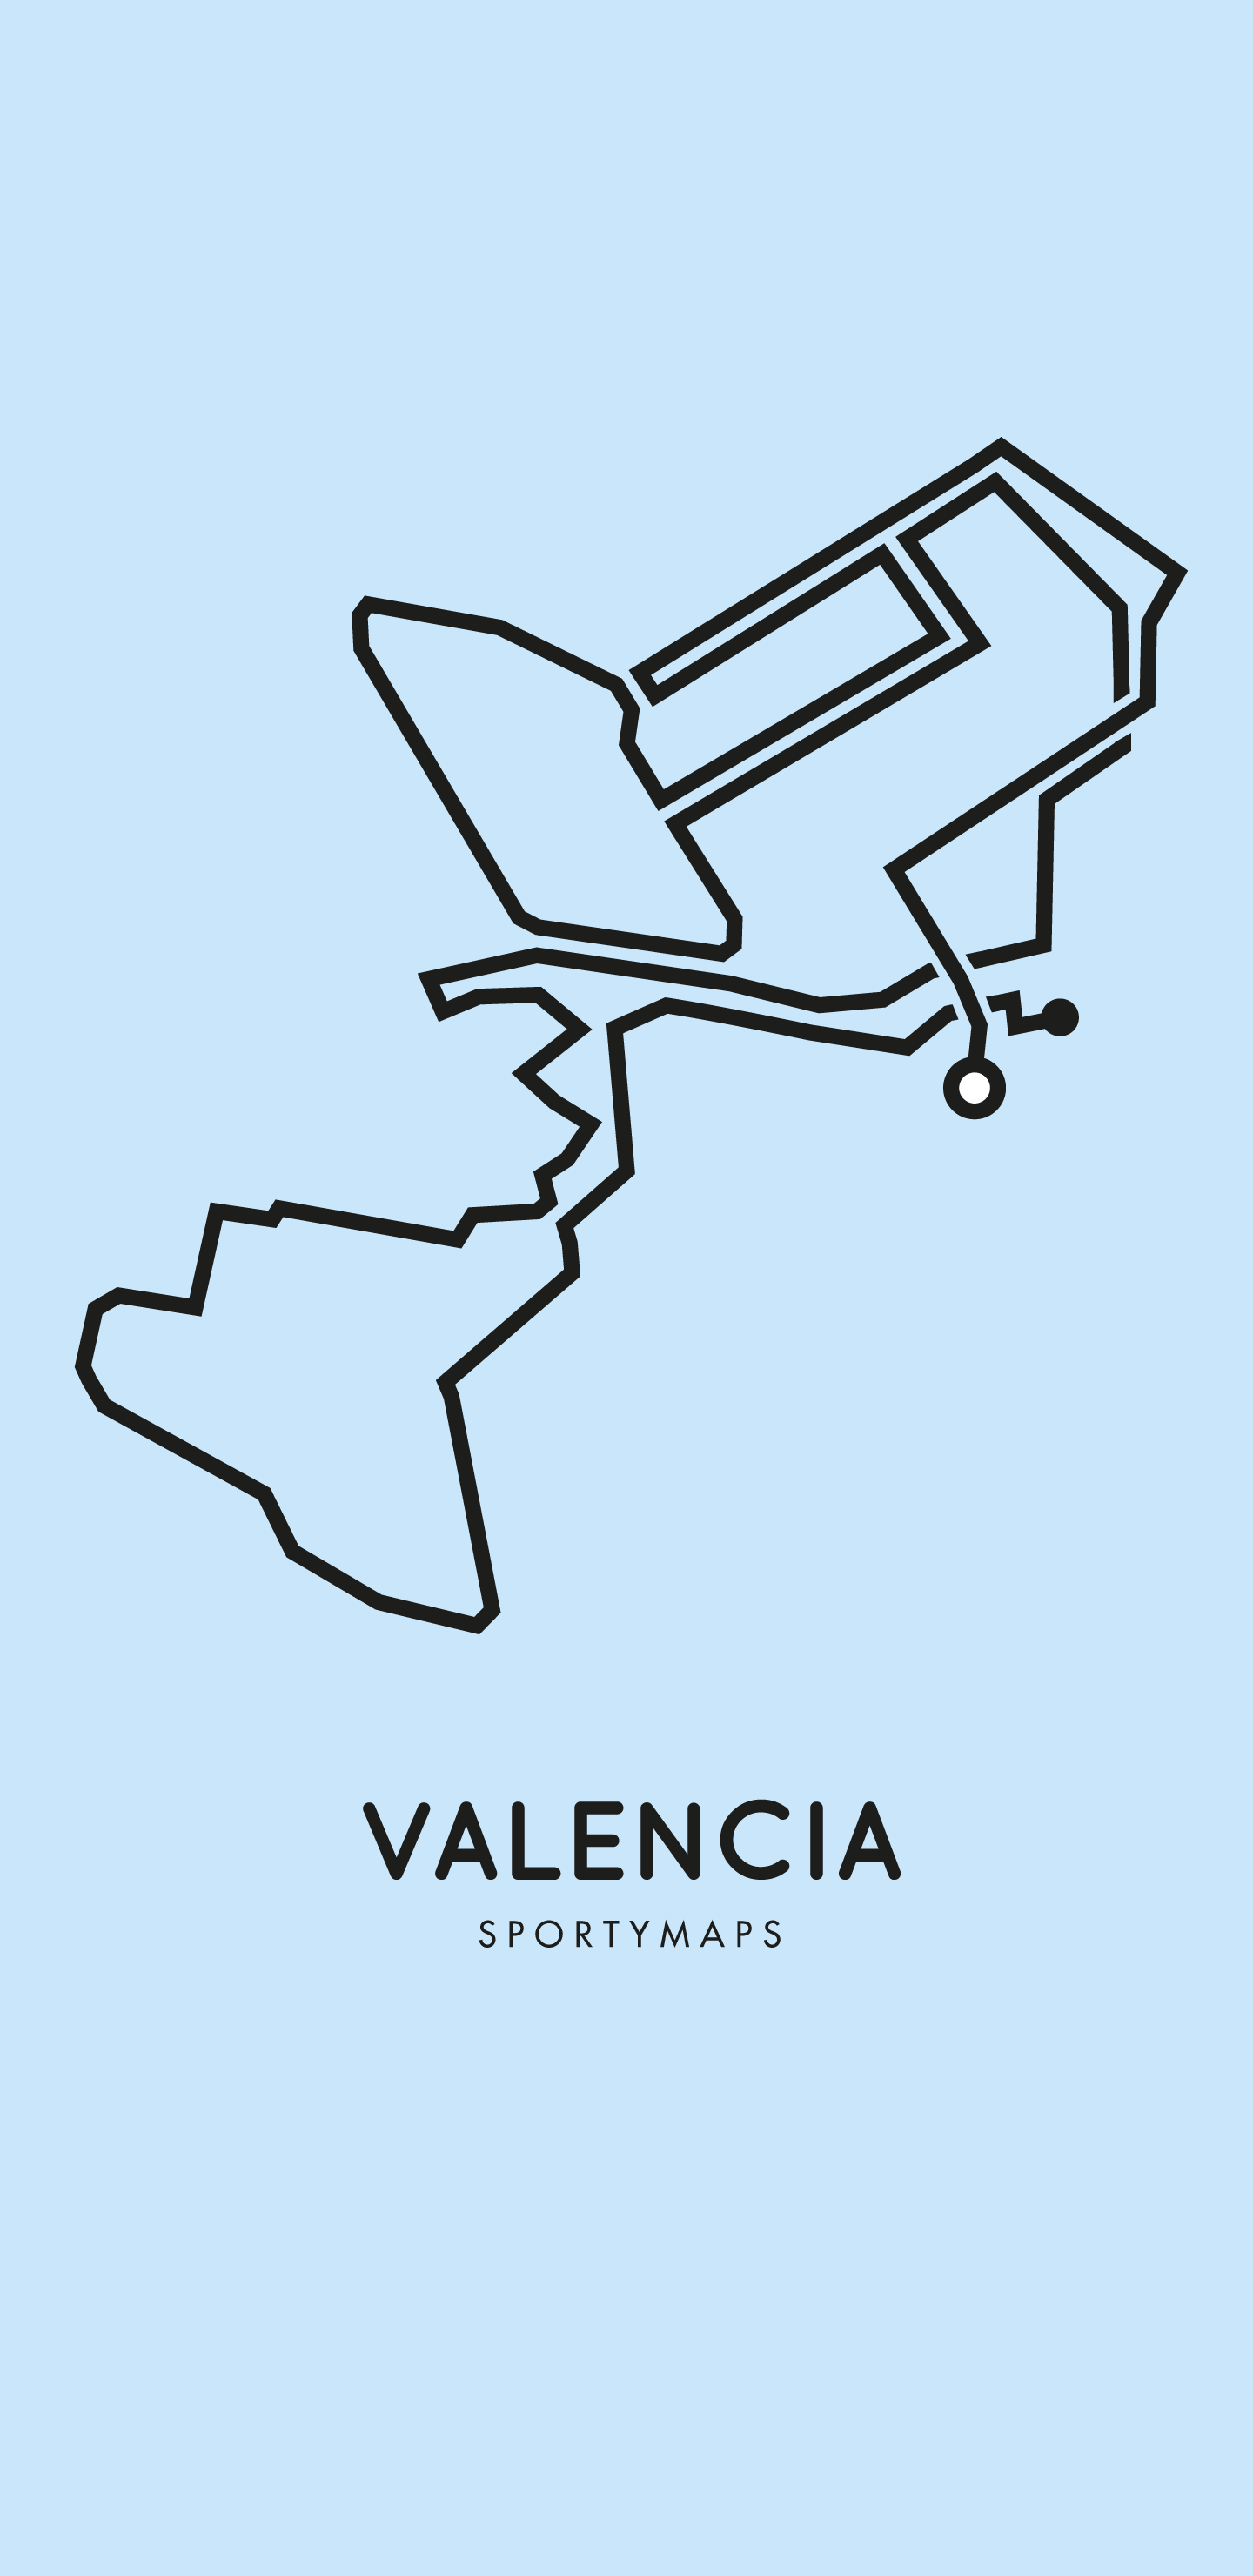 Sportymaps-Valencia-marathon-blue